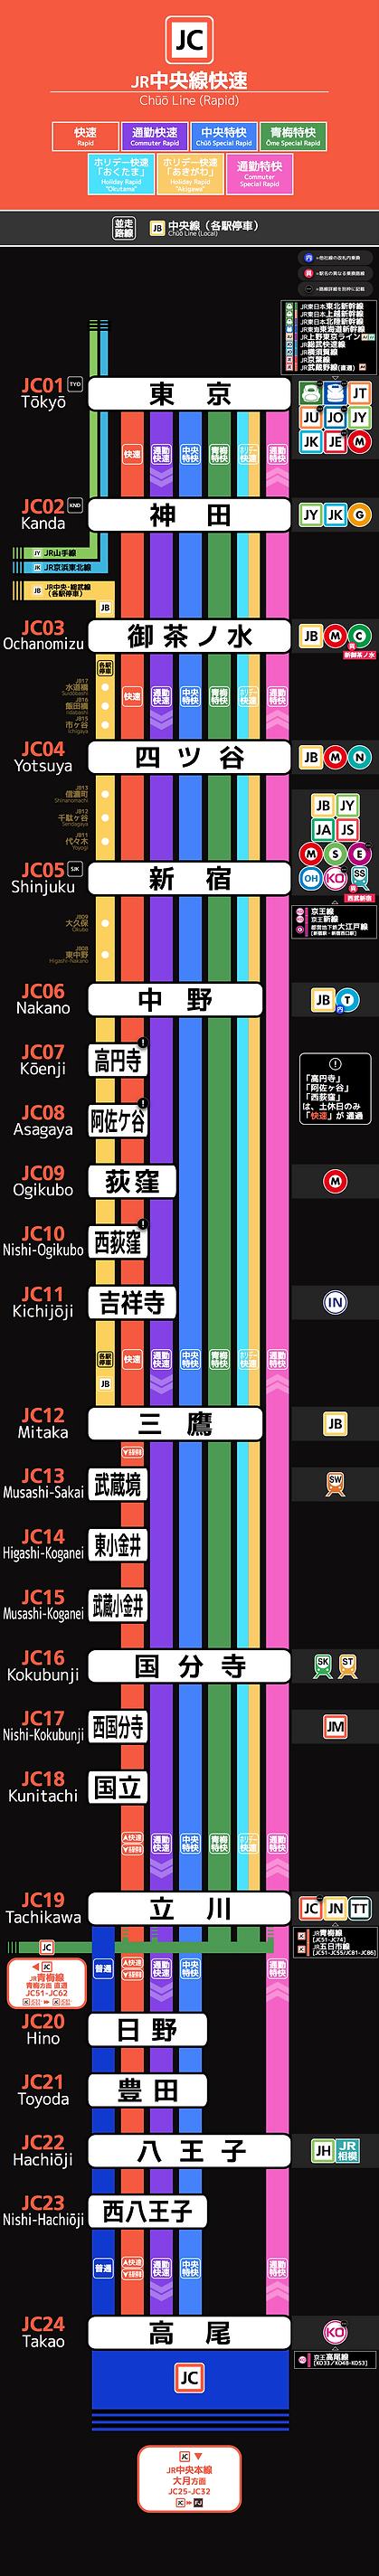 JR中央線快速2_2020-03-01.png